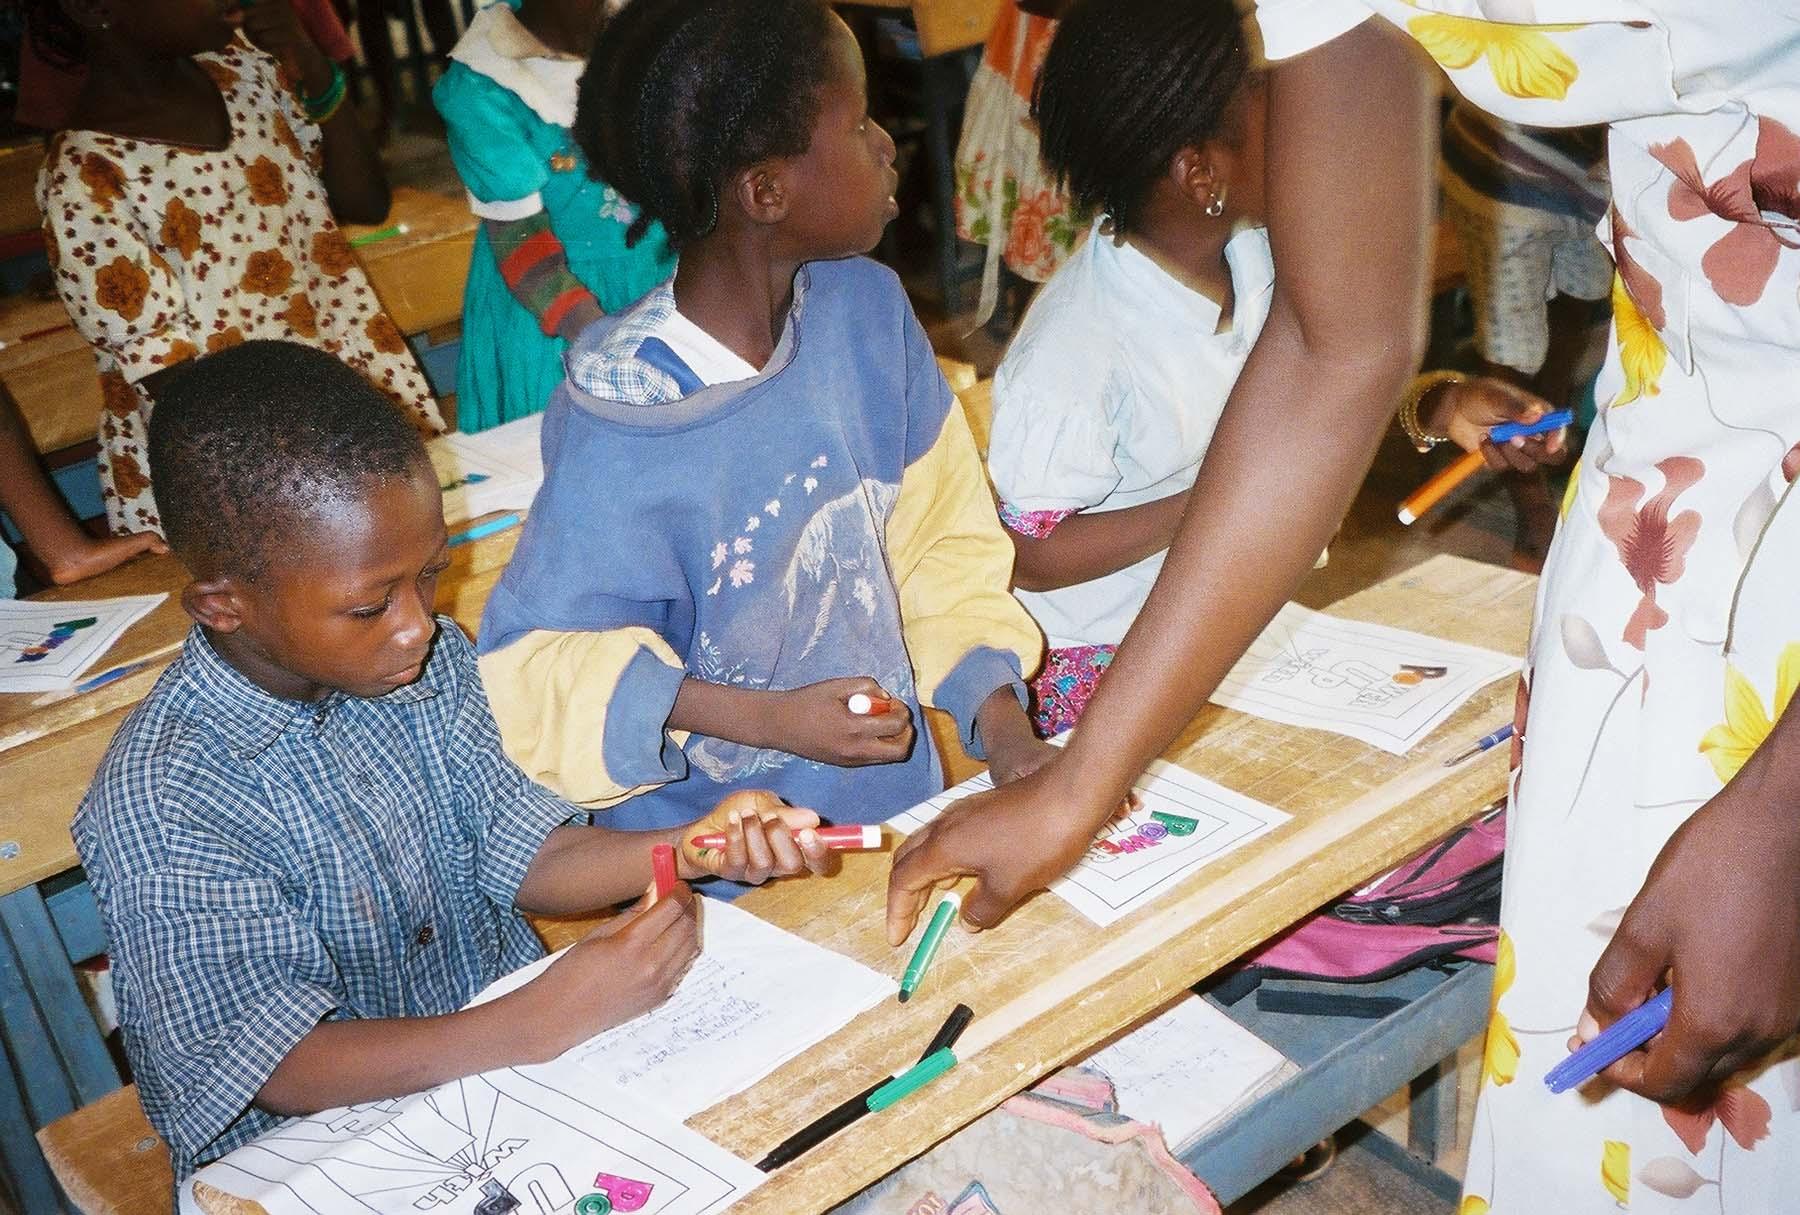 Kids in classroom with teacher